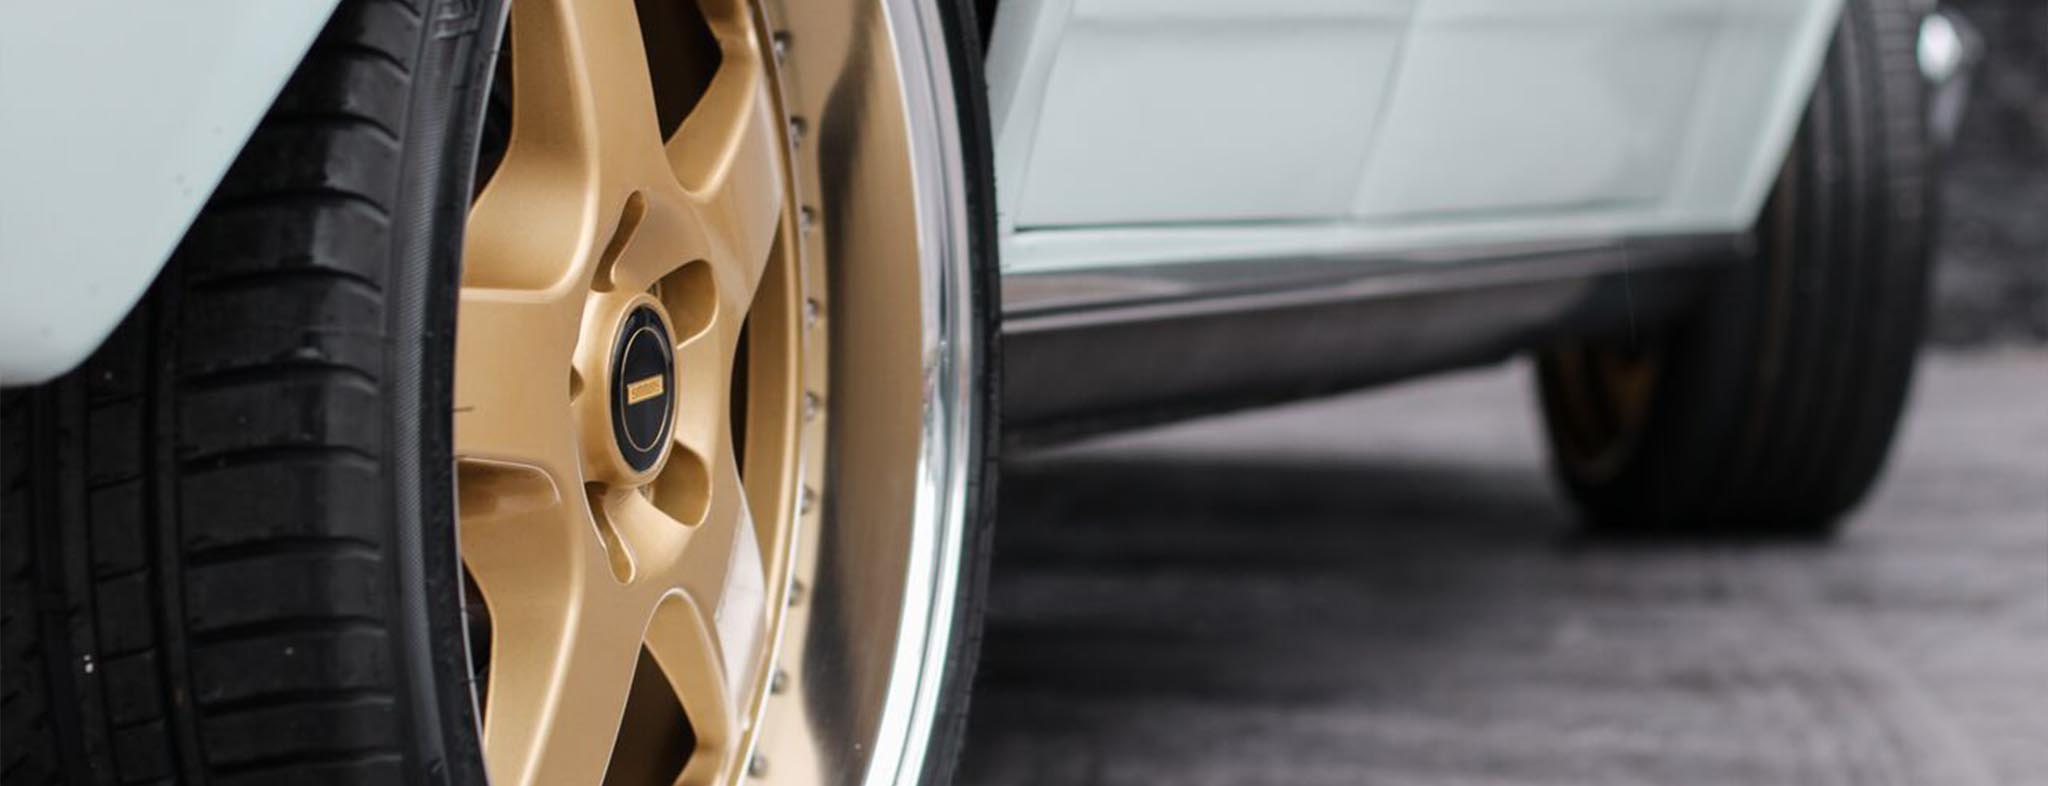 MAG WHEEL REPAIRS IN BLACKTOWN - CNC Wheels